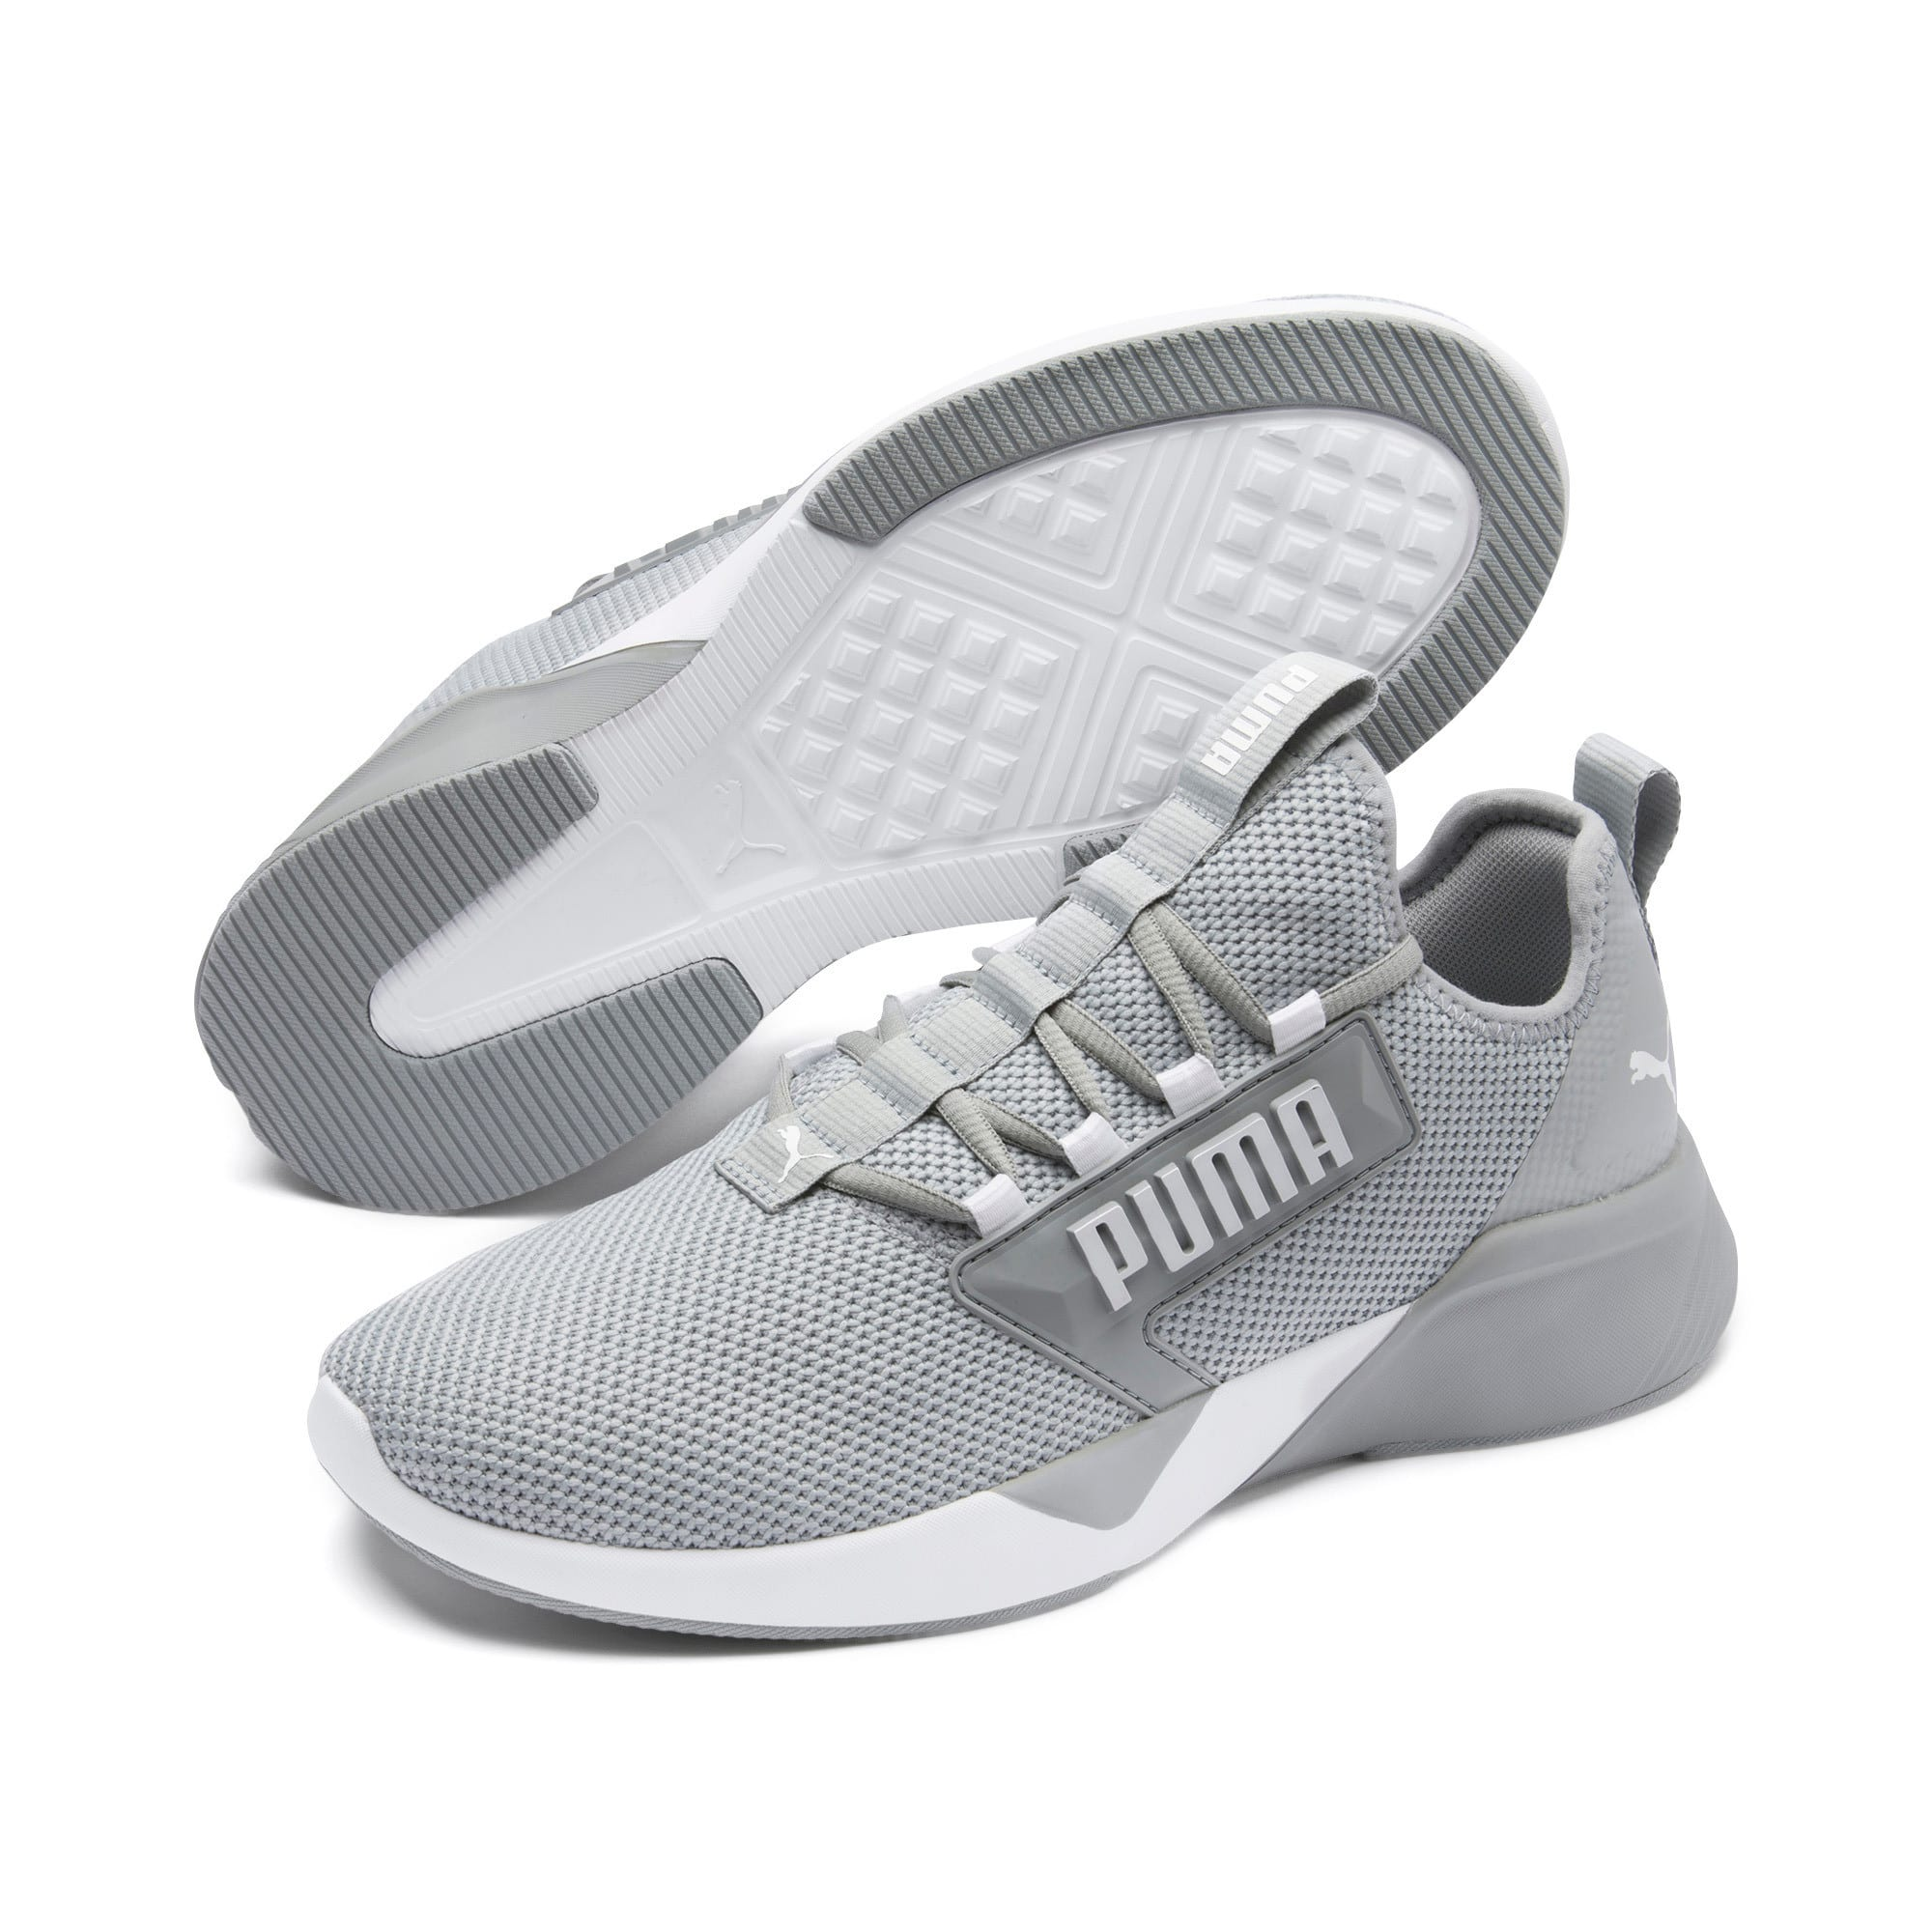 Thumbnail 2 of Retaliate Men's Training Shoes, Quarry-Puma Black, medium